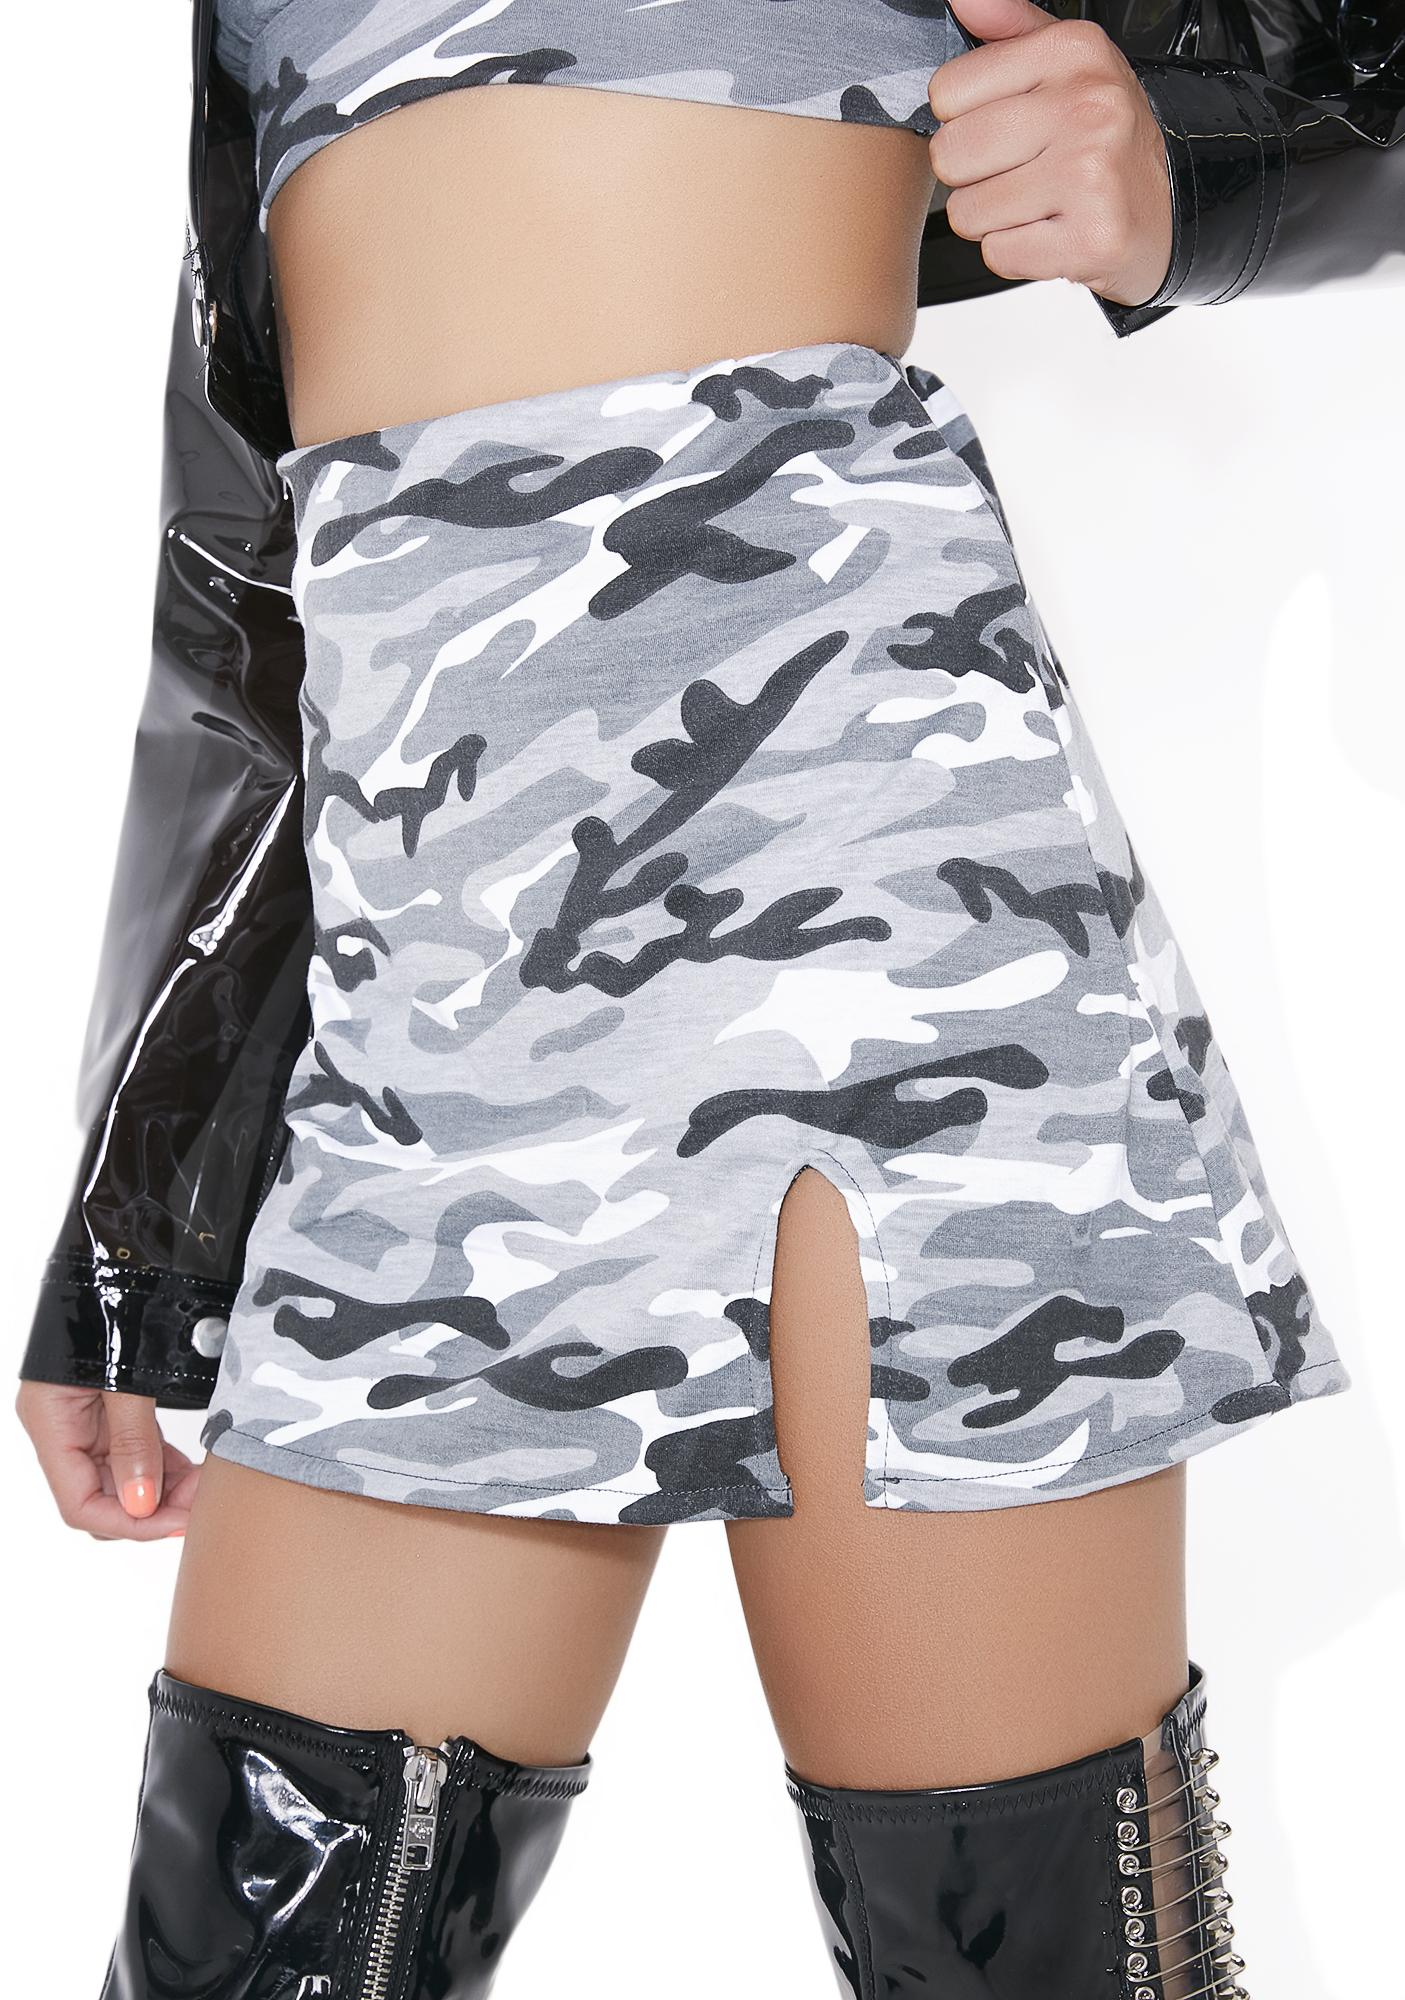 O Mighty Camo Baby Skirt